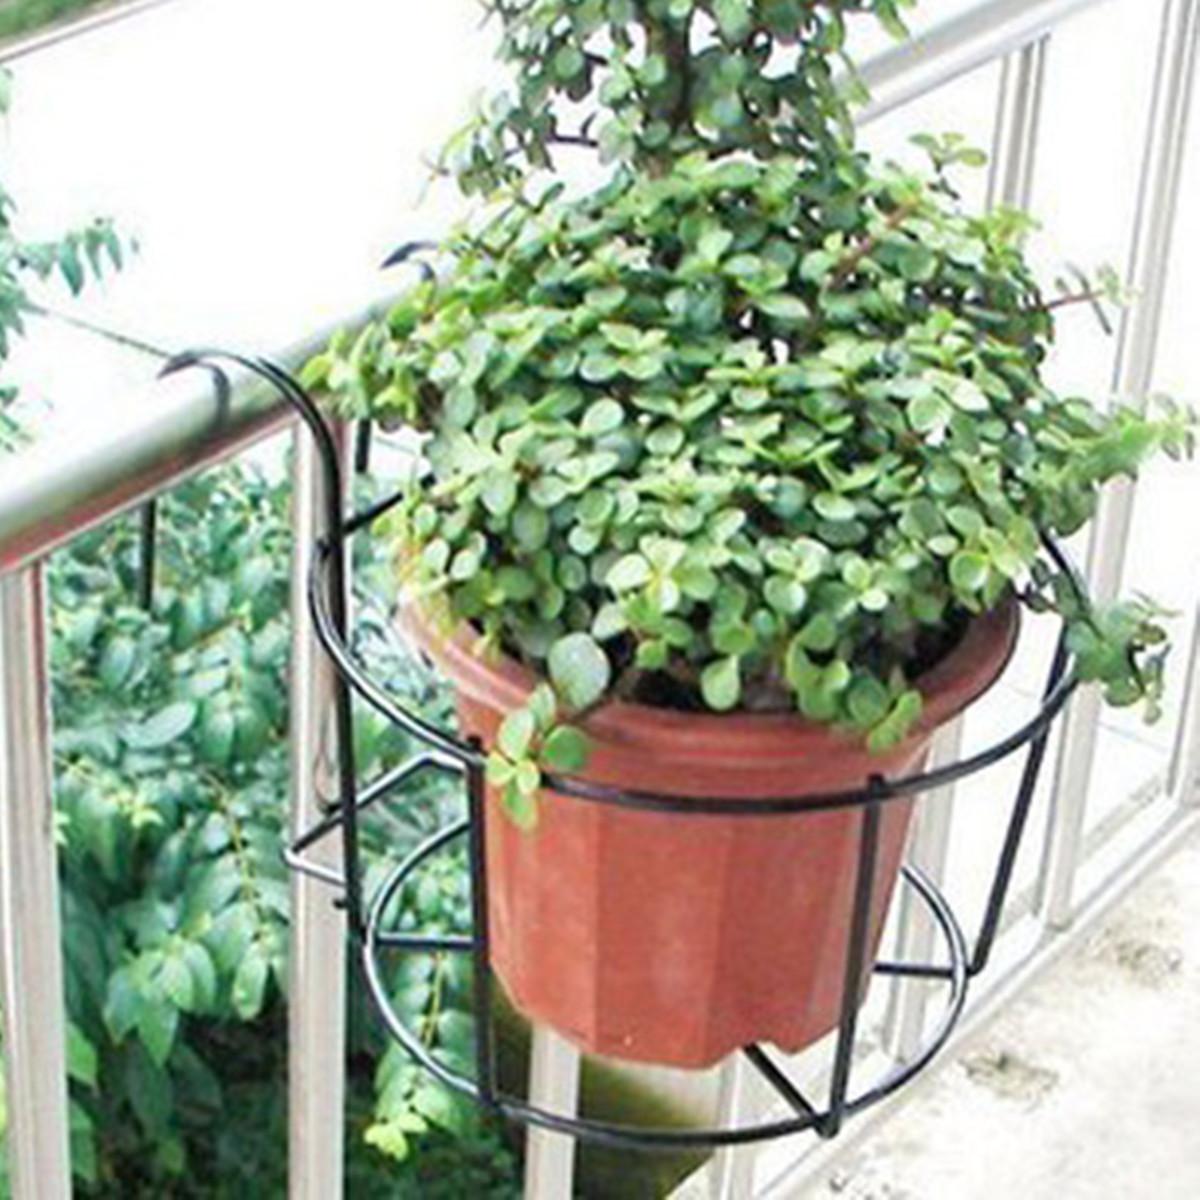 Metal Iron Flower Pot Hanging Balcony Garden Plant Planter Home Decor Basket Ebay